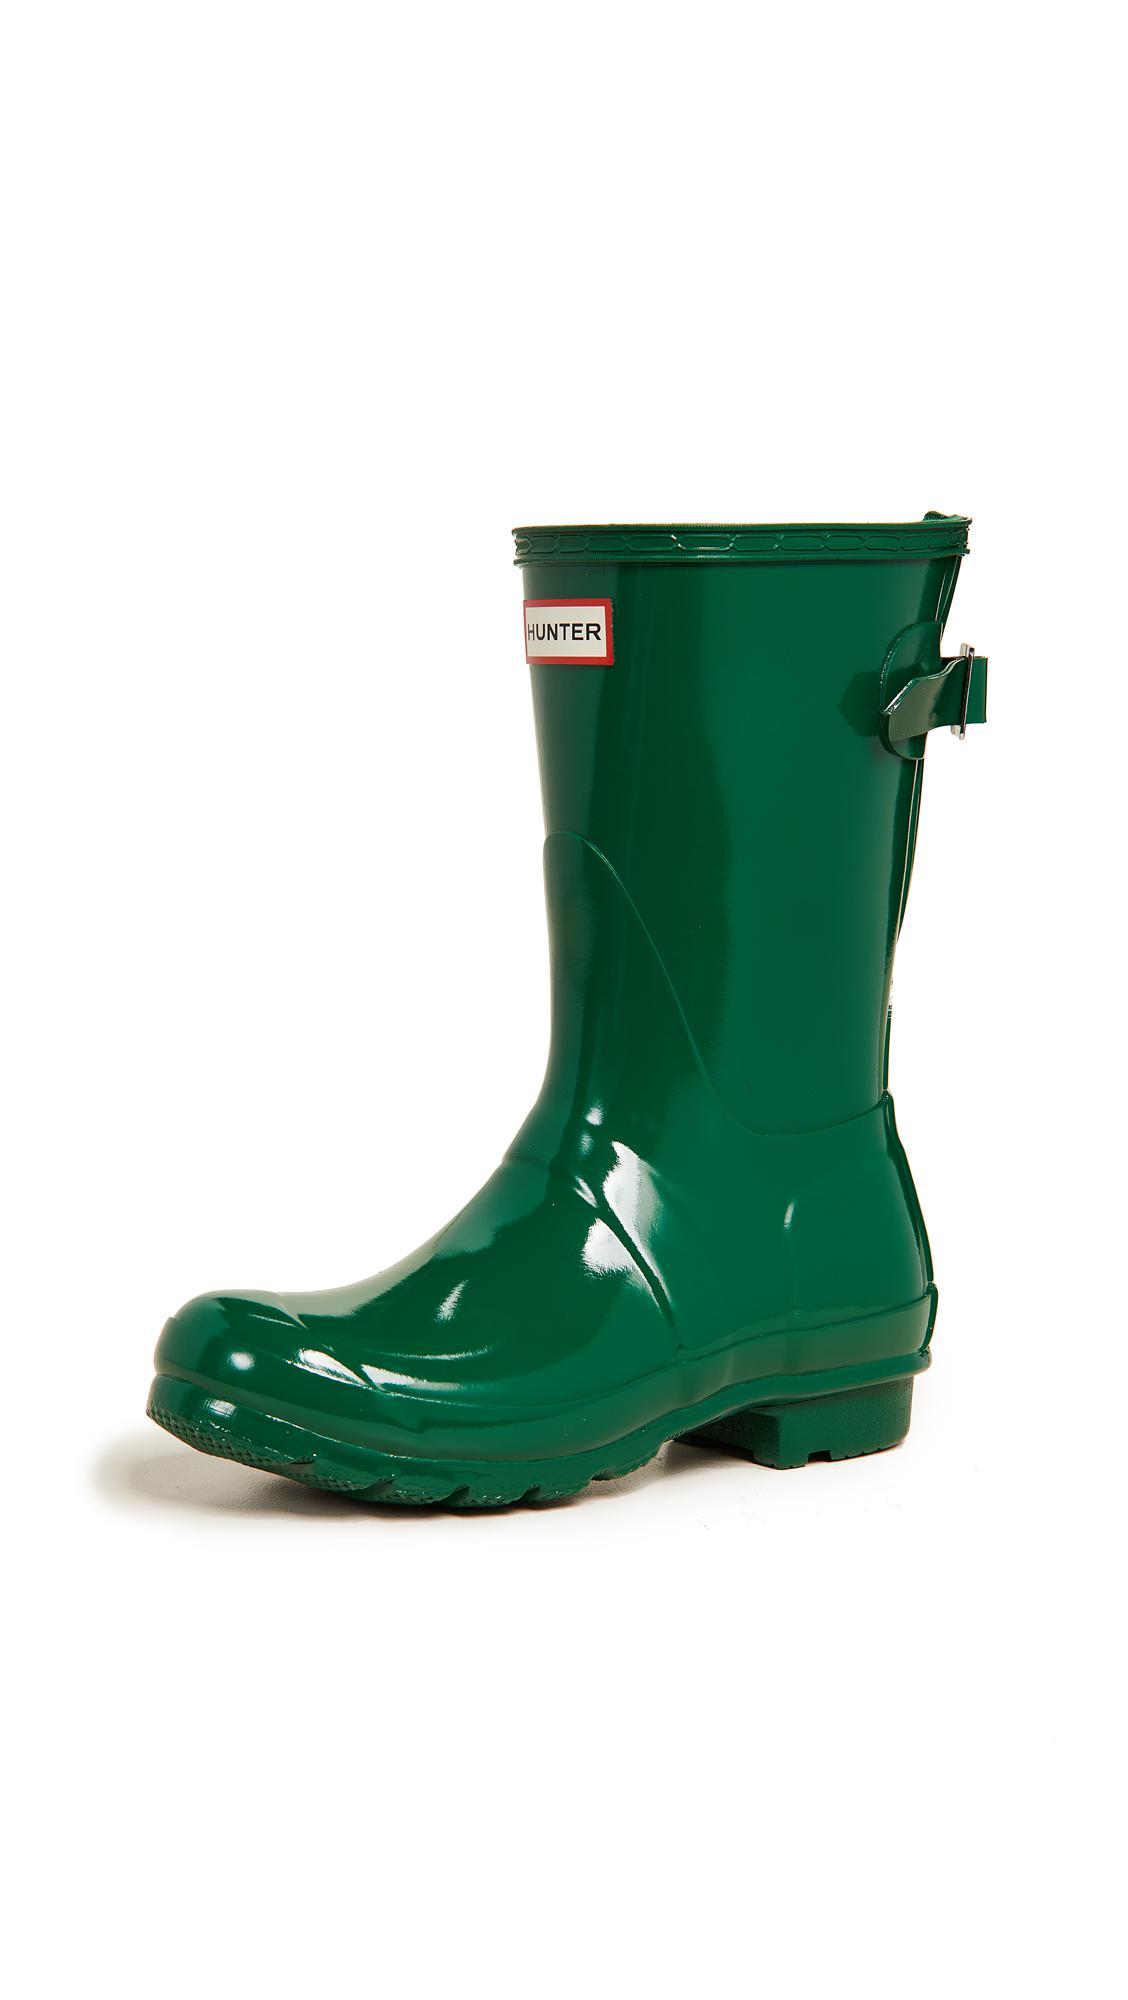 HUNTER Rubber Original Short Boots in Green